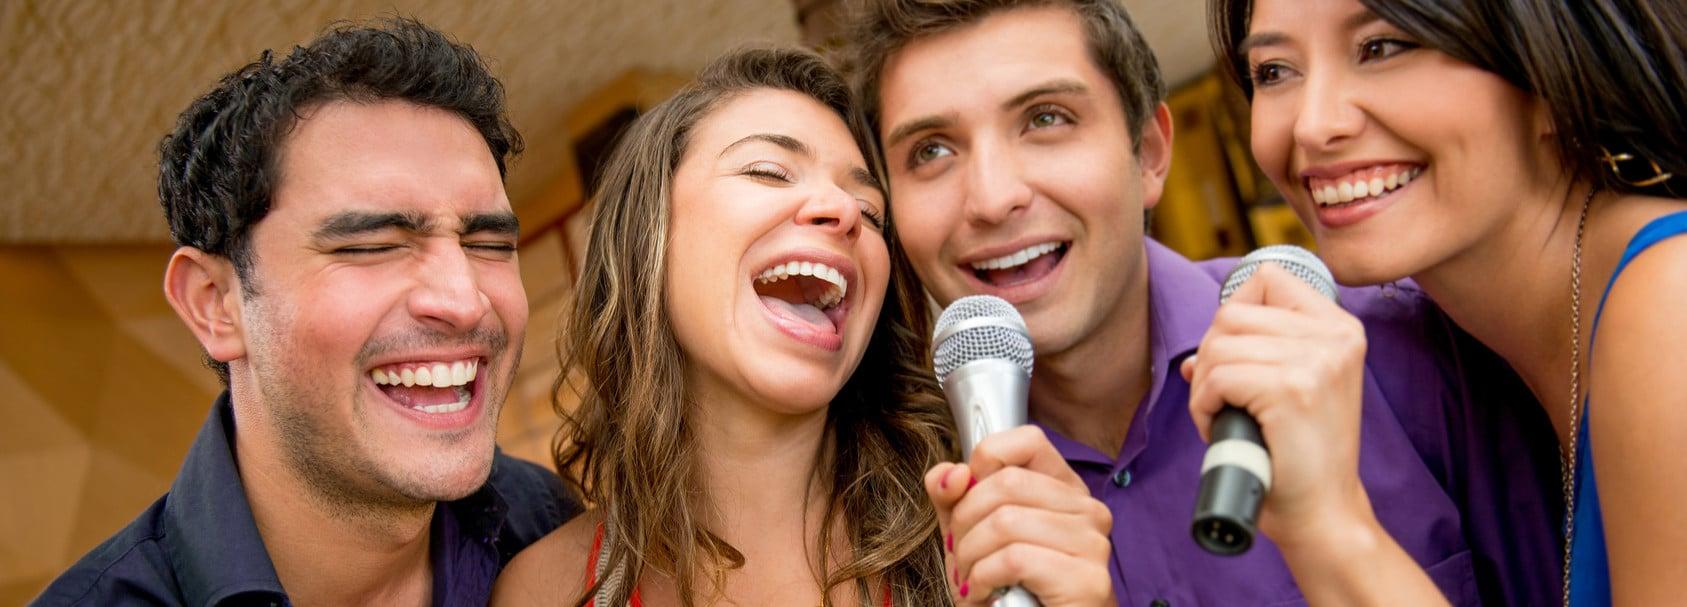 Alquilar-proyector-para-karaoke-e1431896181940